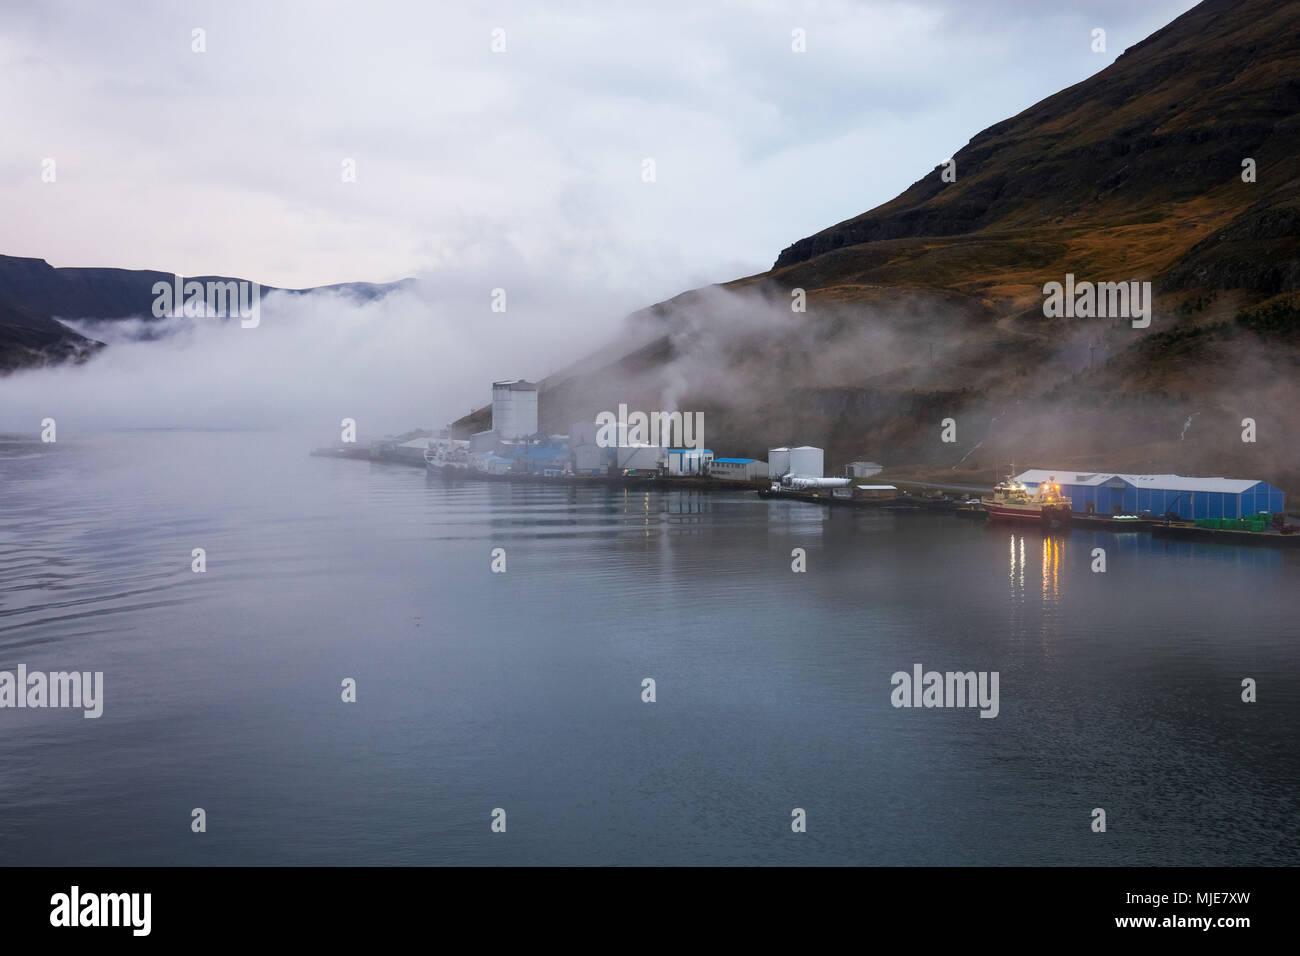 Fish factory in Seydisfjordur, Iceland - Stock Image